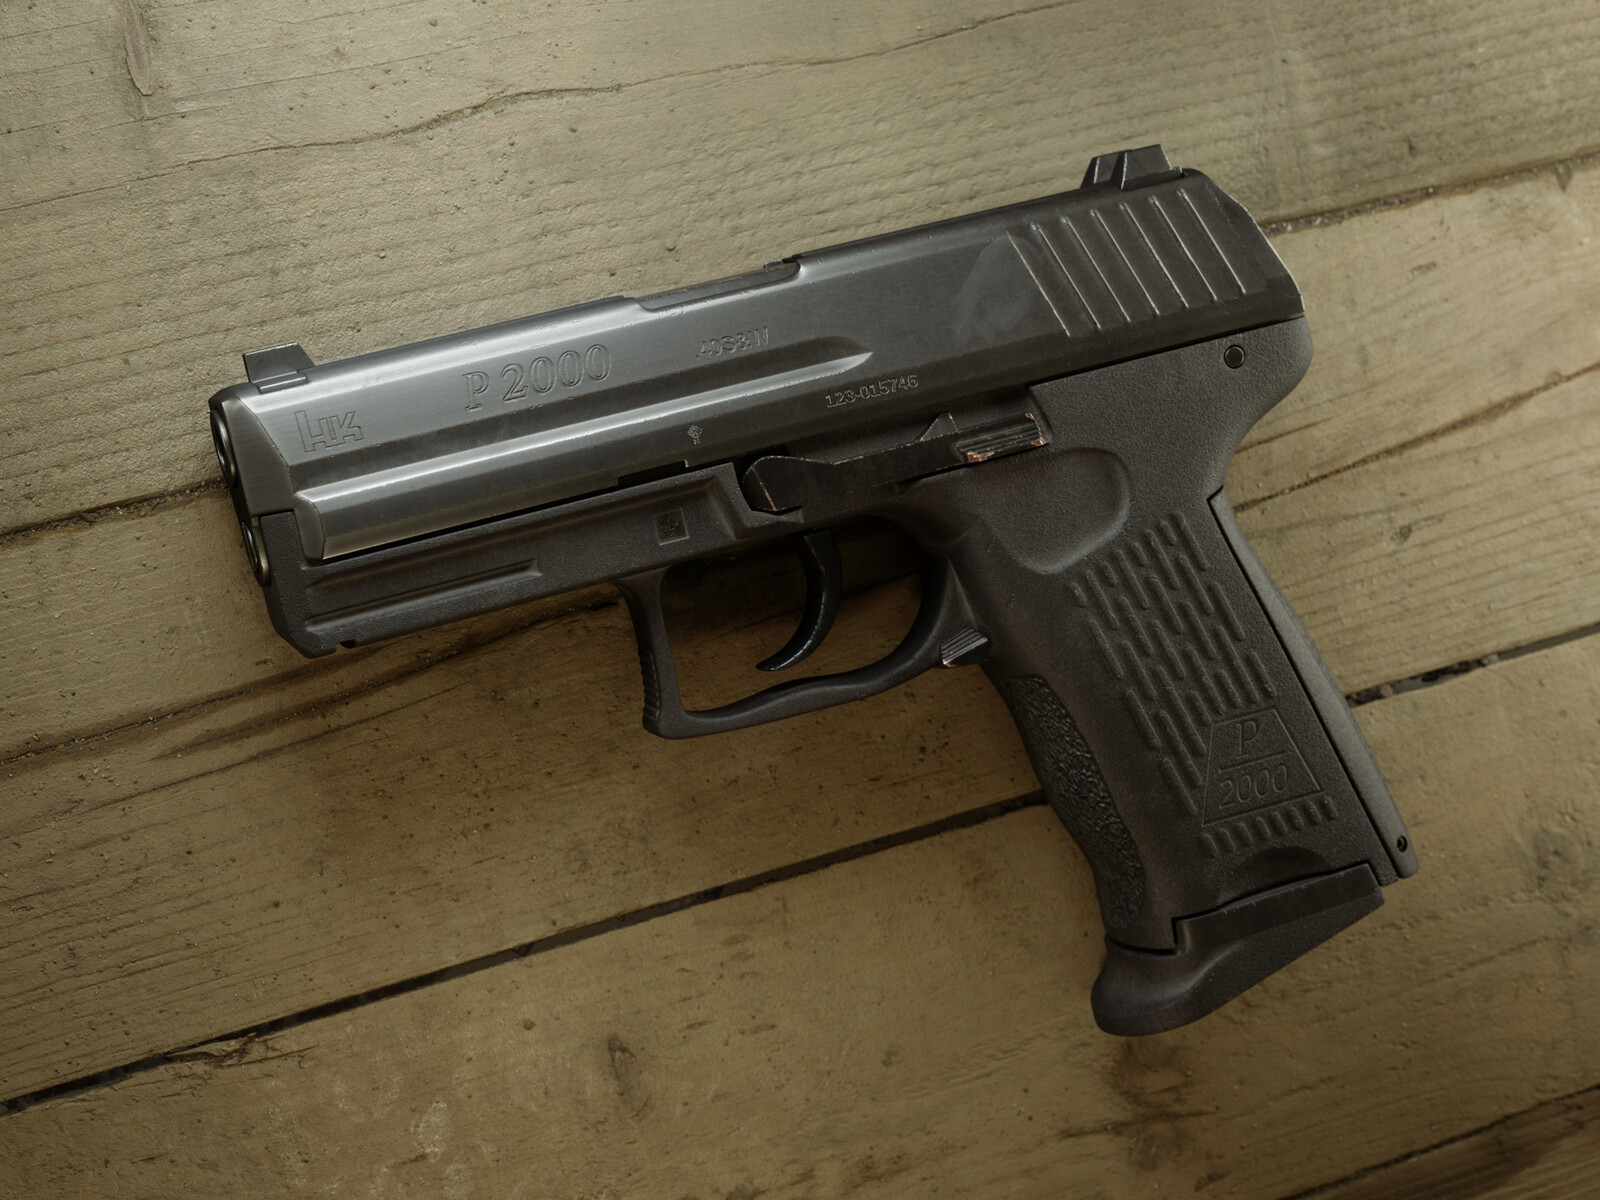 HK P2000 Handgun